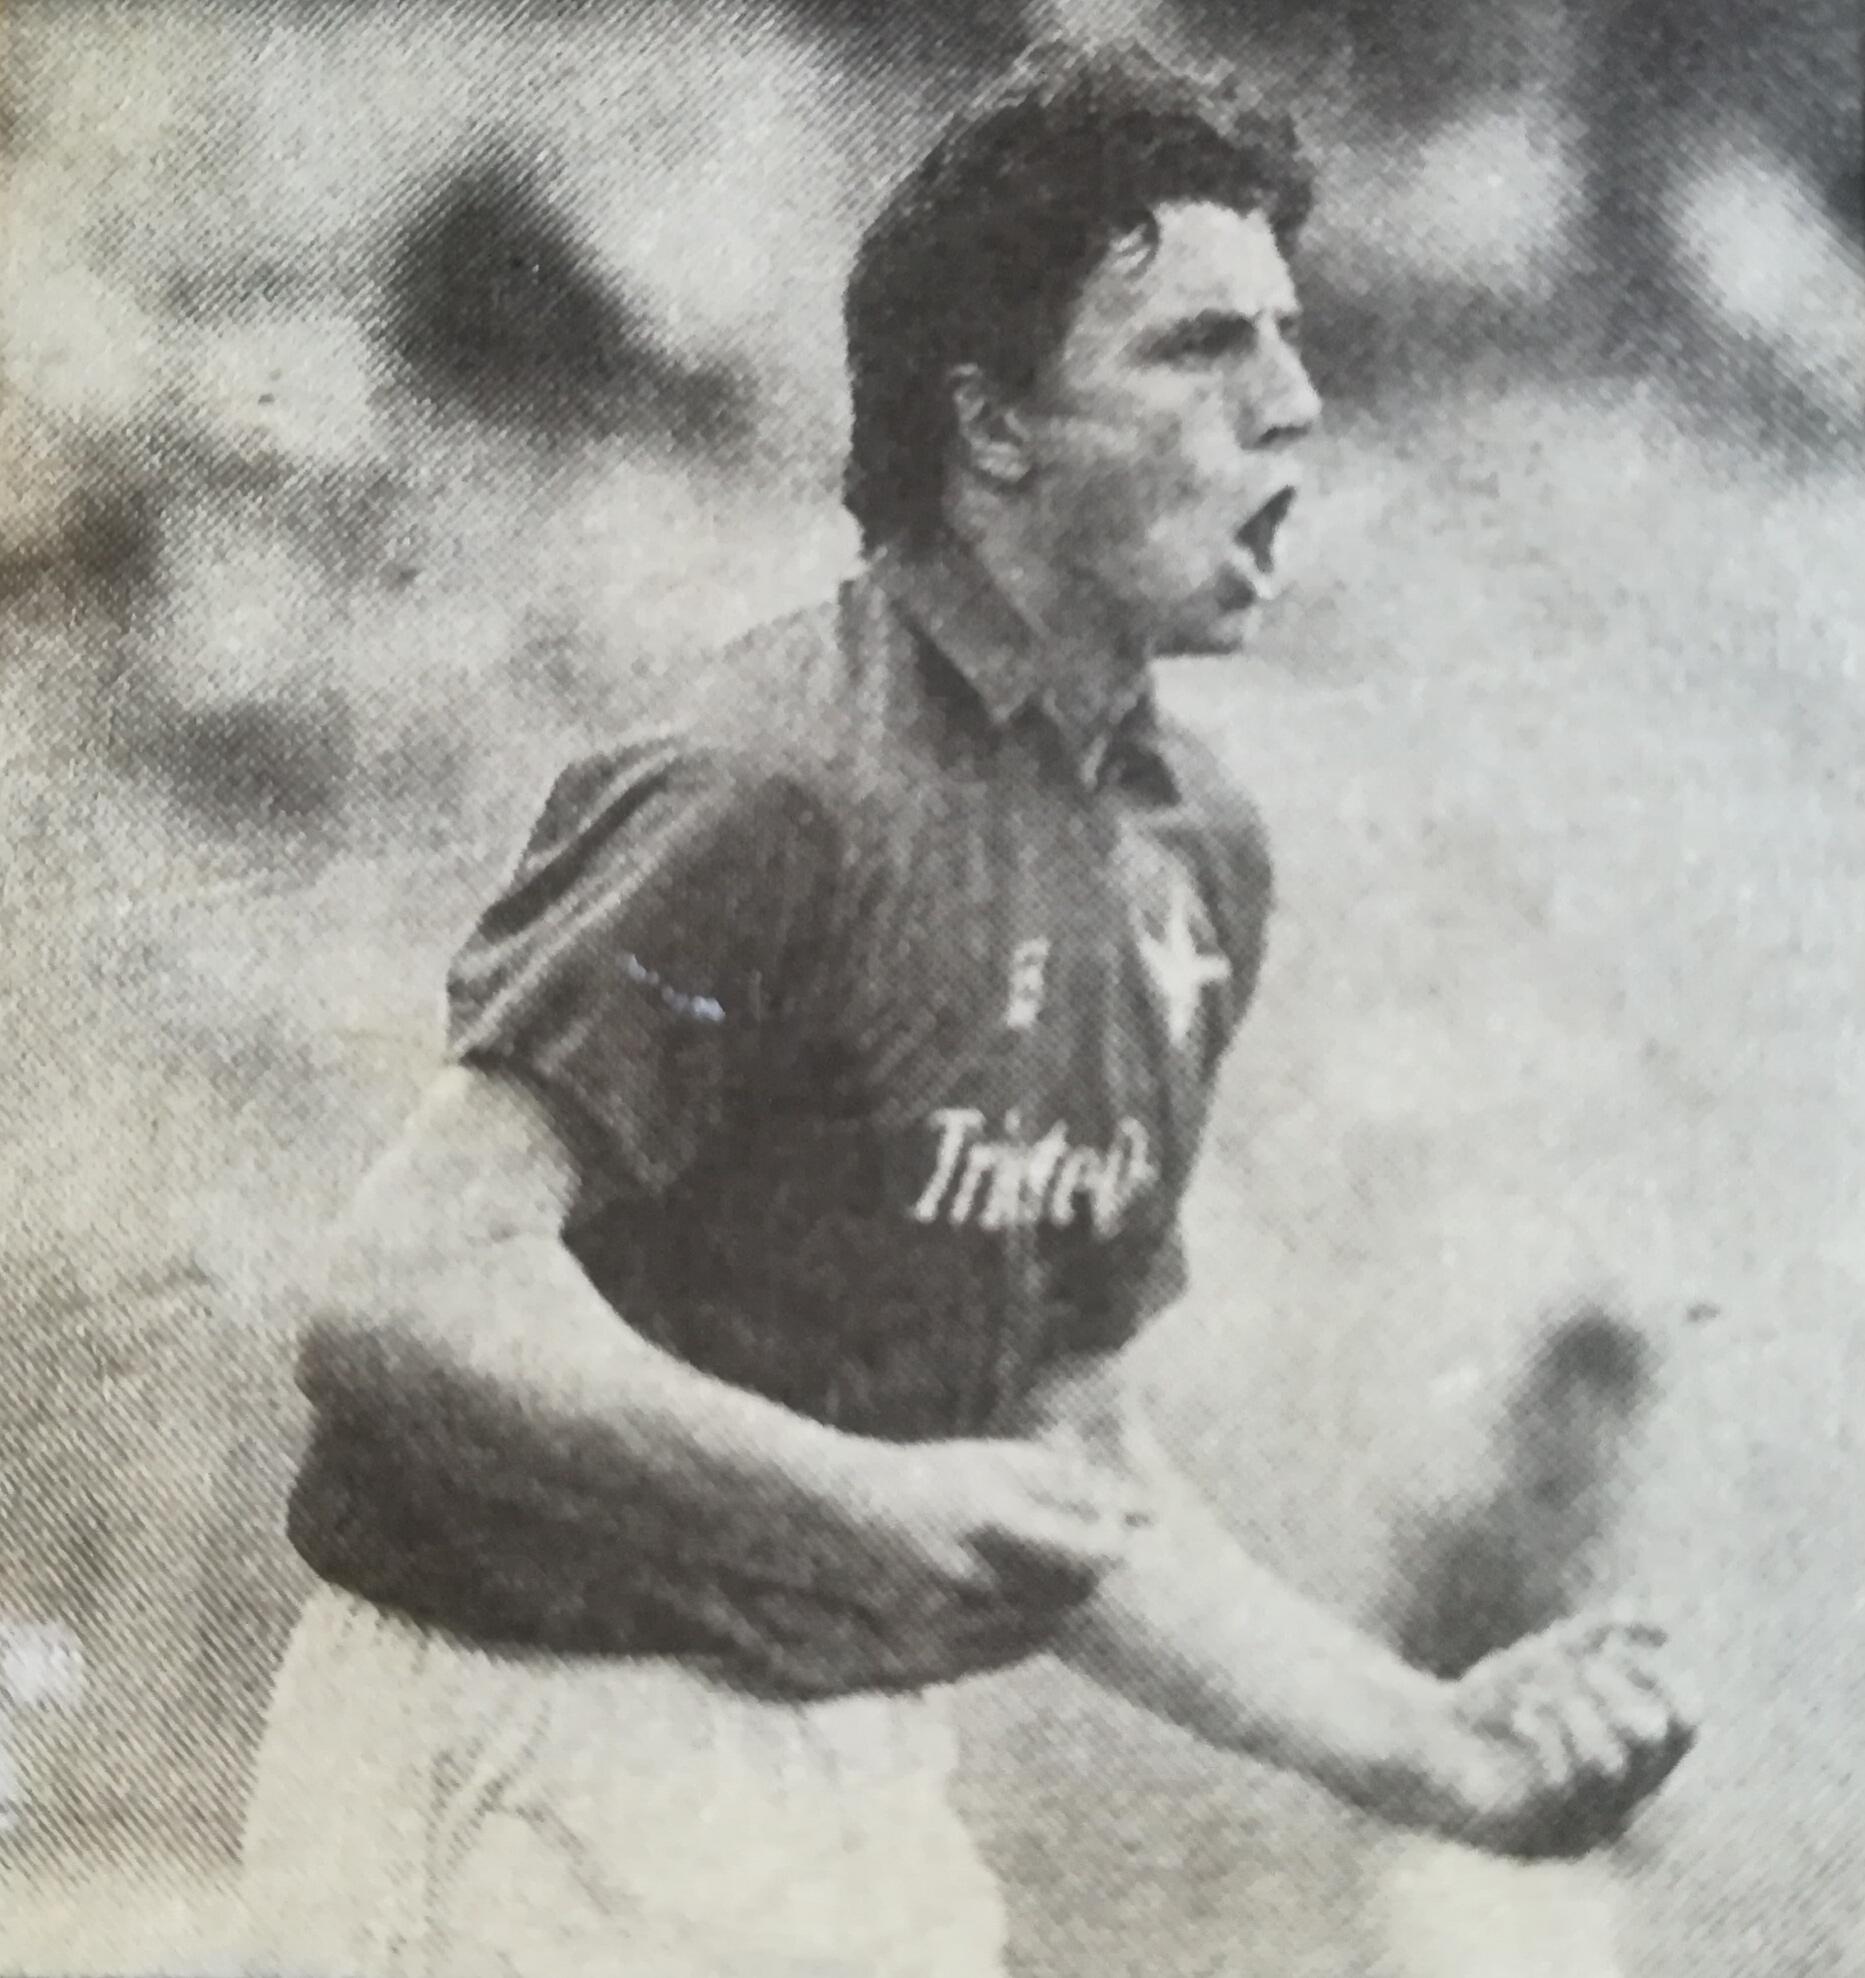 1991/92